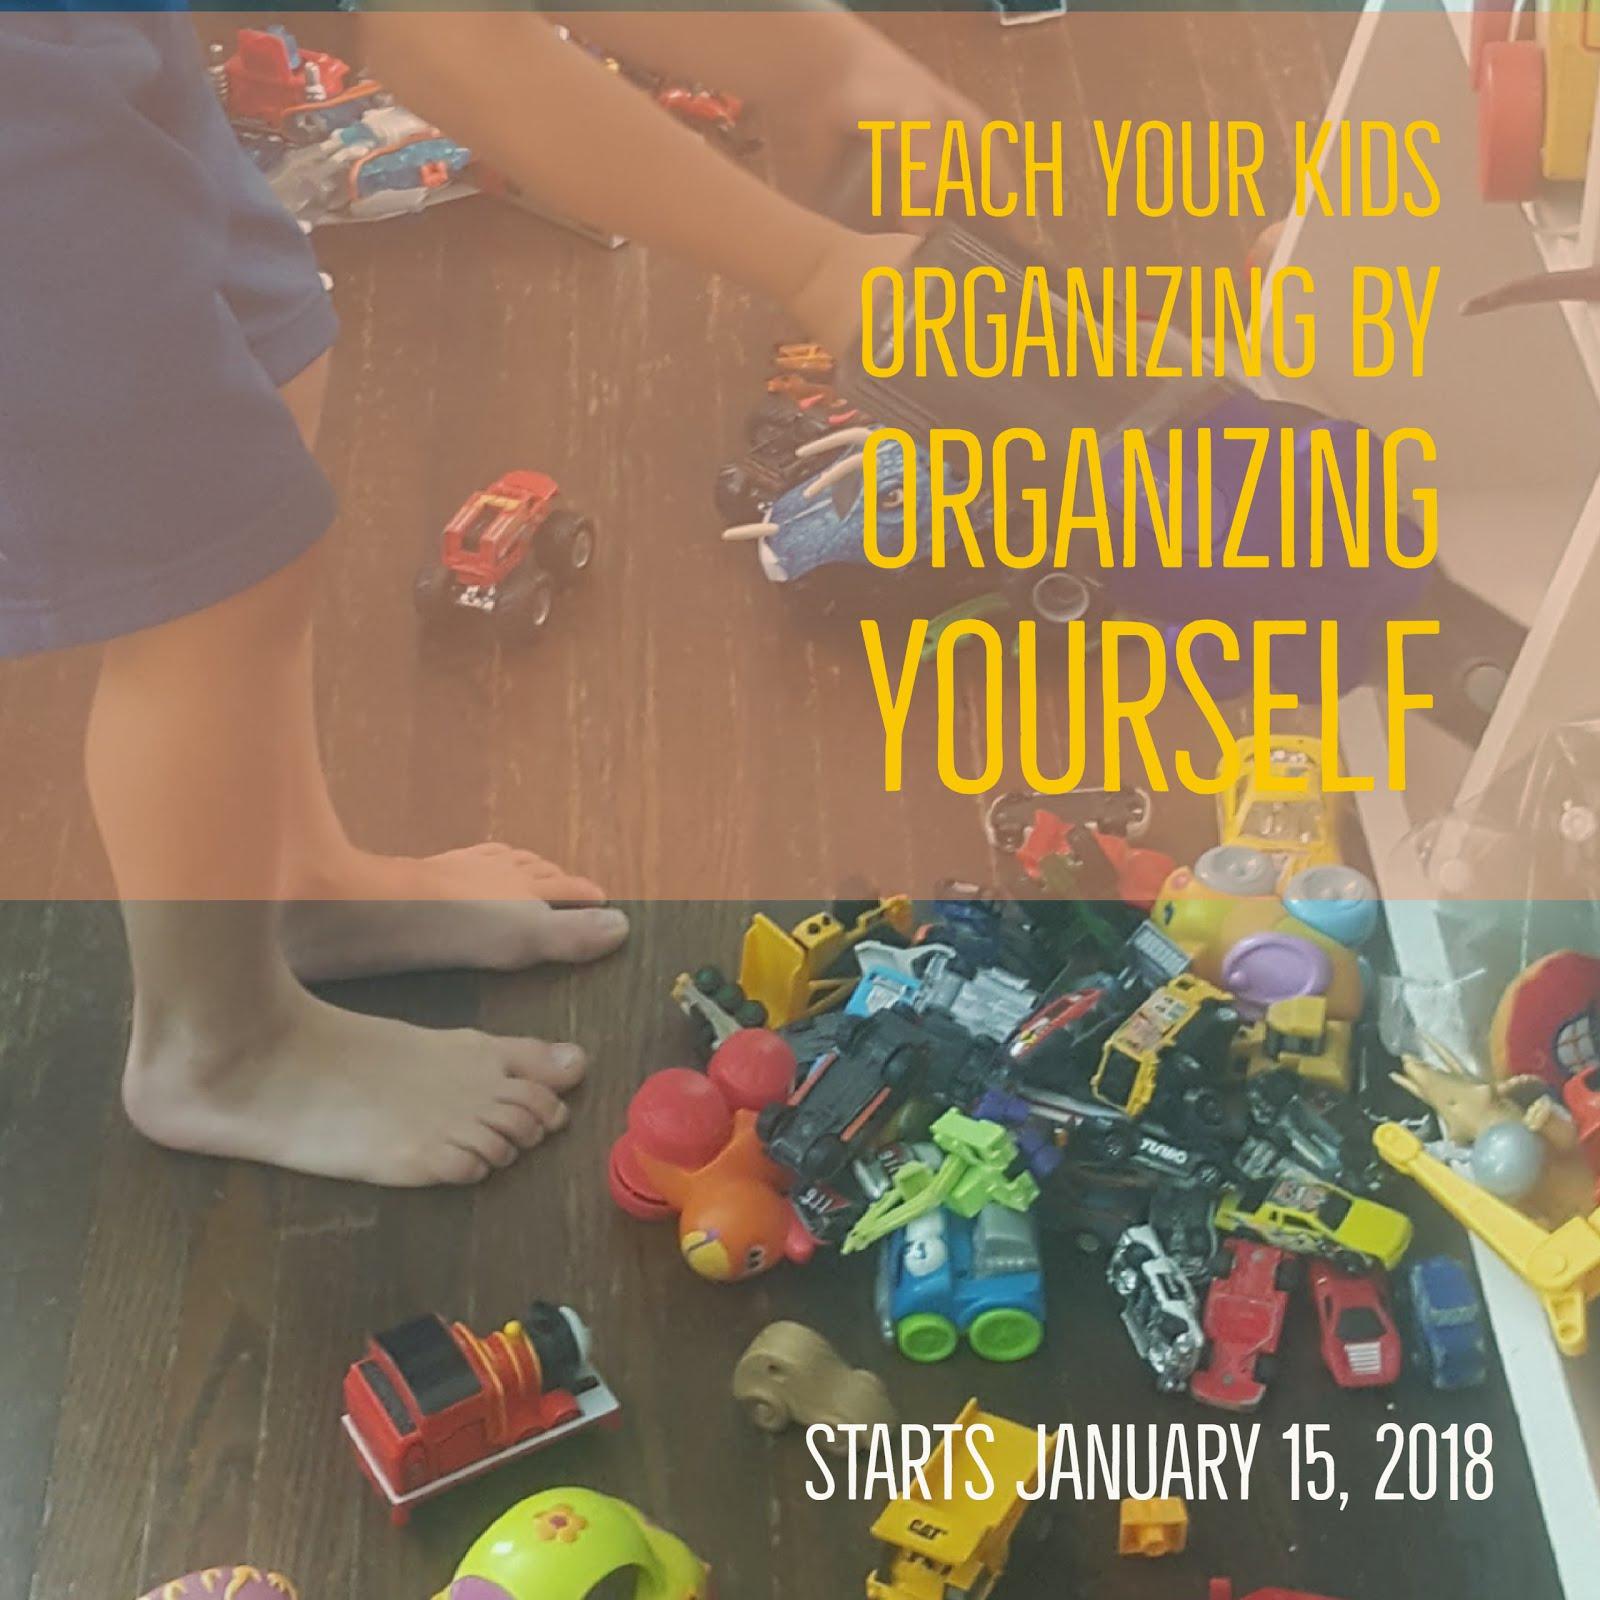 Upcoming Organizing Class